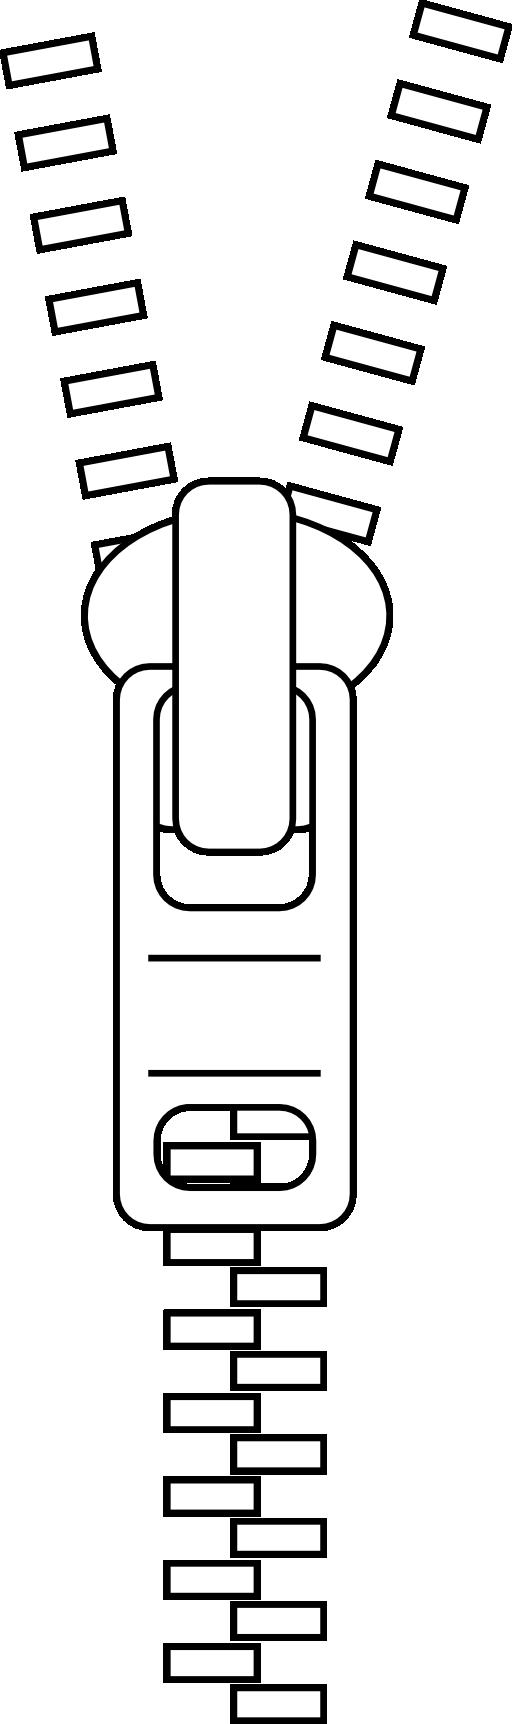 free clip art zip line - photo #37